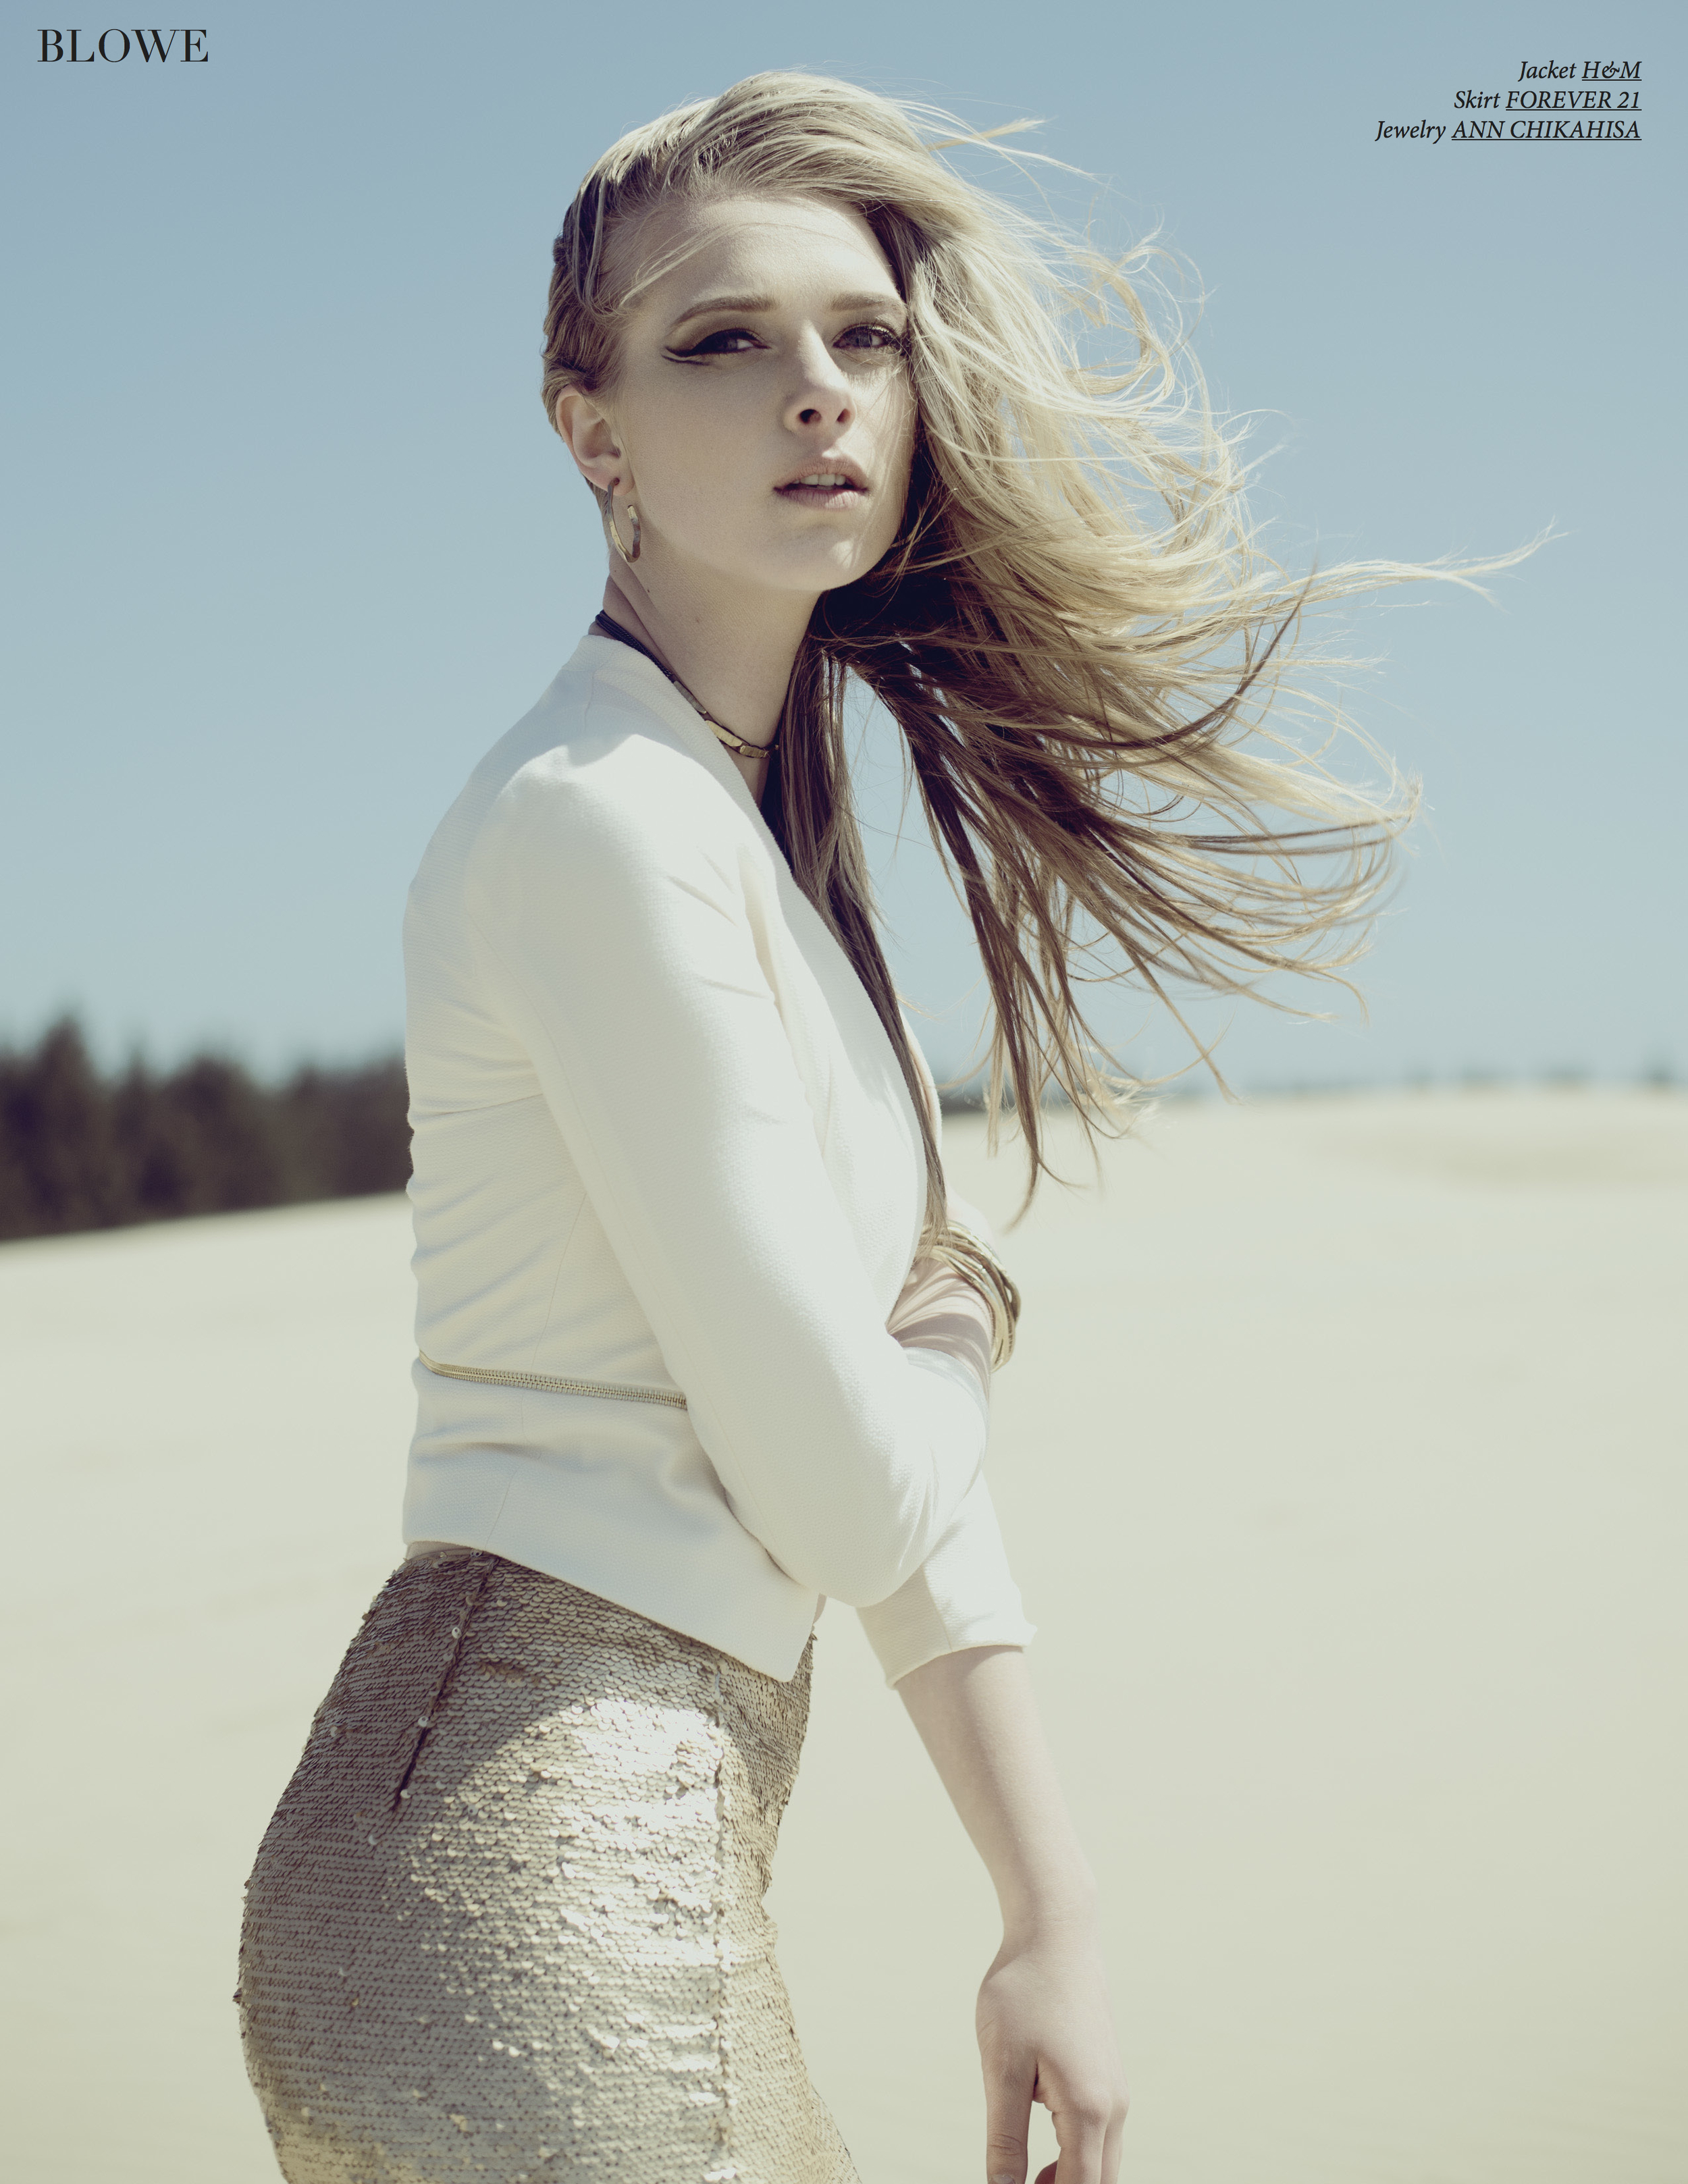 Alecia Lindsay LA fashion and lifestyle Photographer